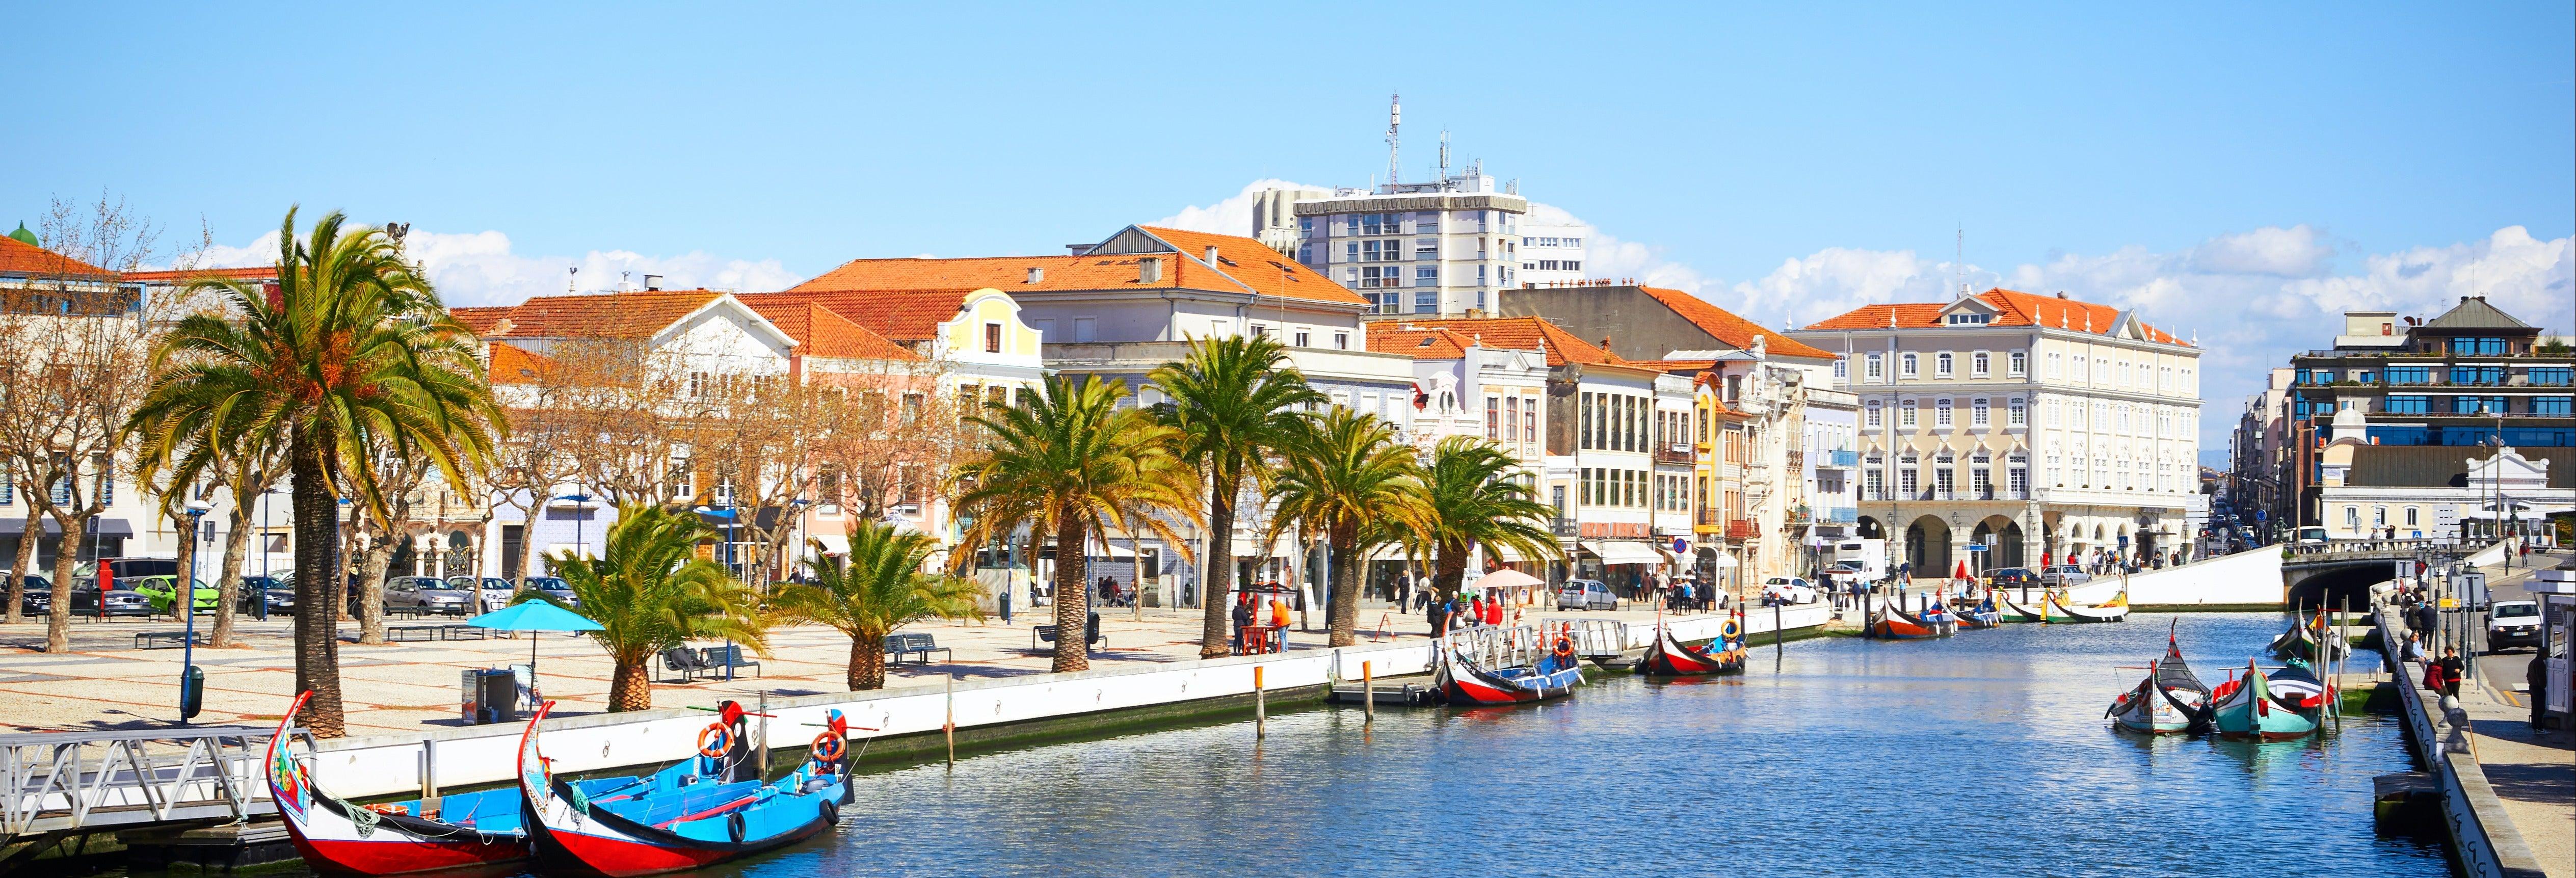 Aveiro City Tour & Moliceiro Cruise